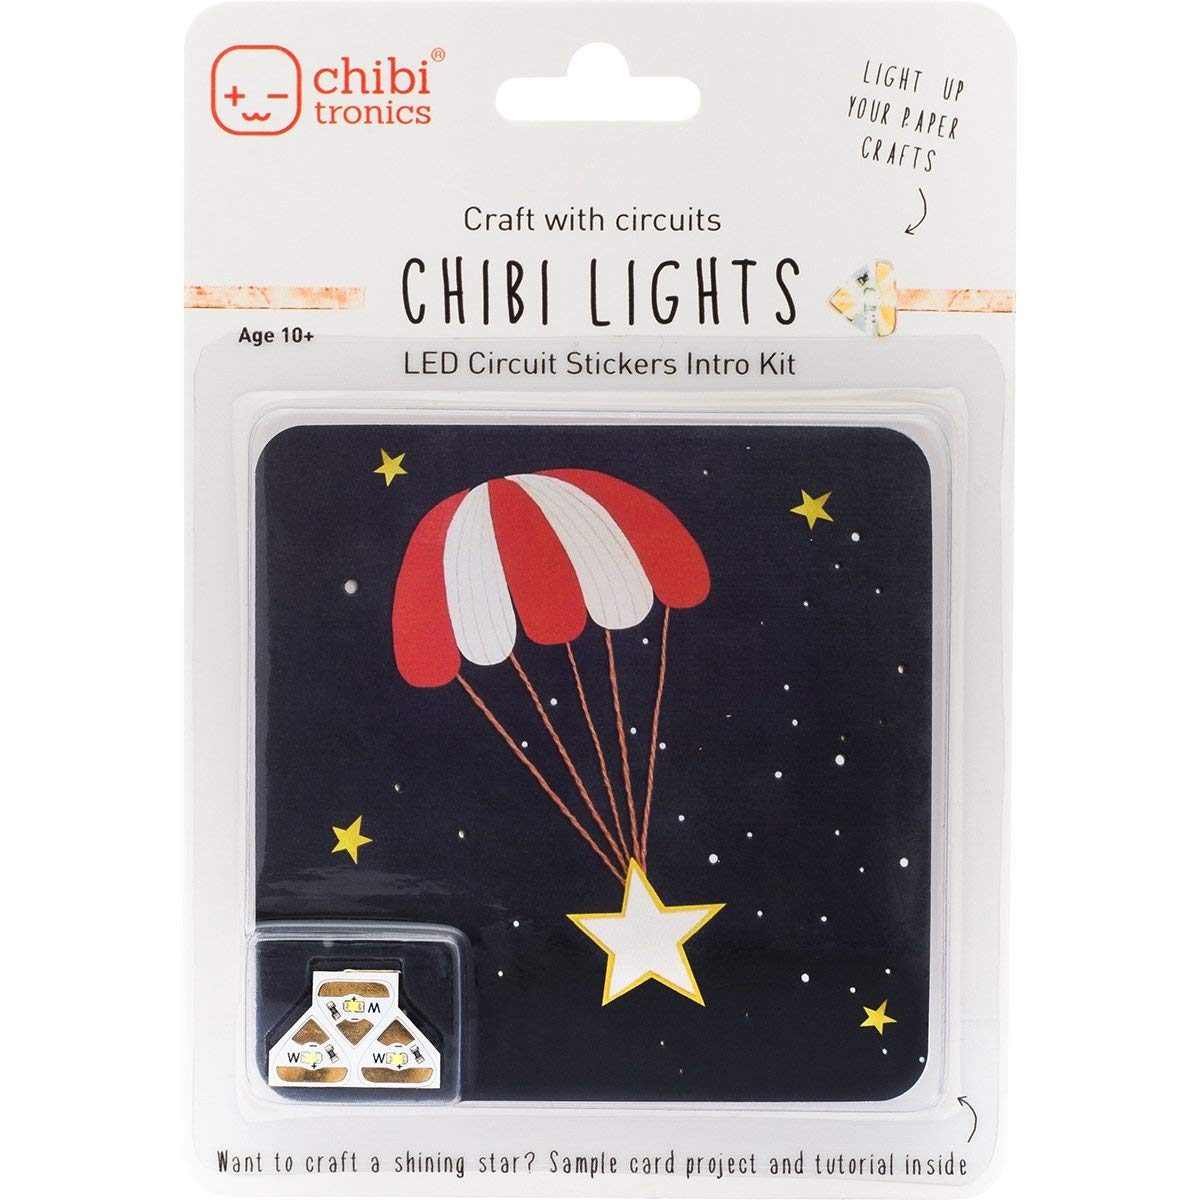 Chibitronics Chibi Lights LED Circuit Stickers Intro Kit